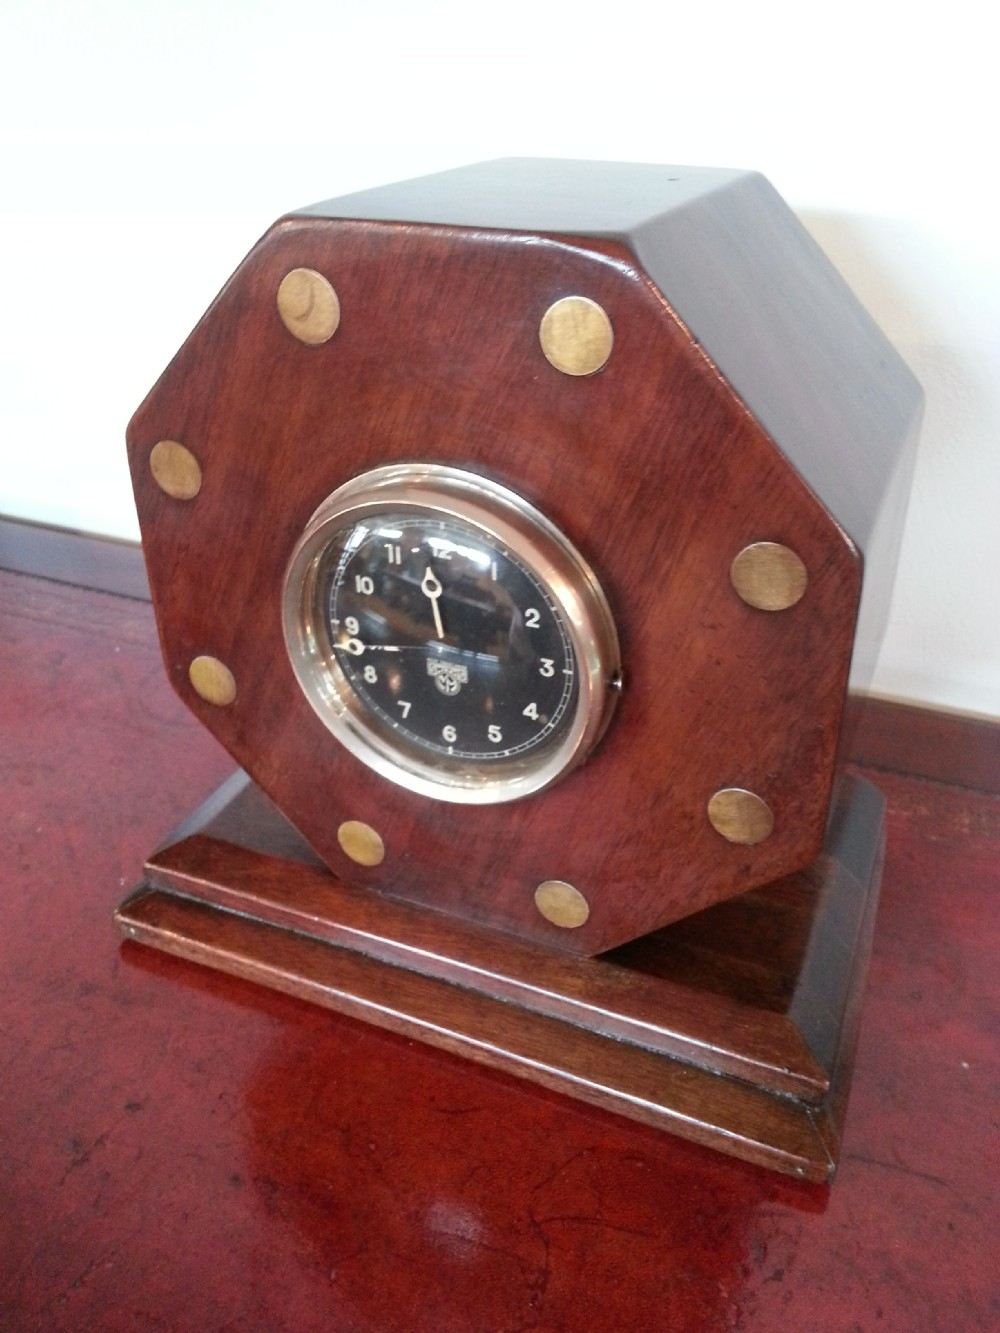 propellor hub clock